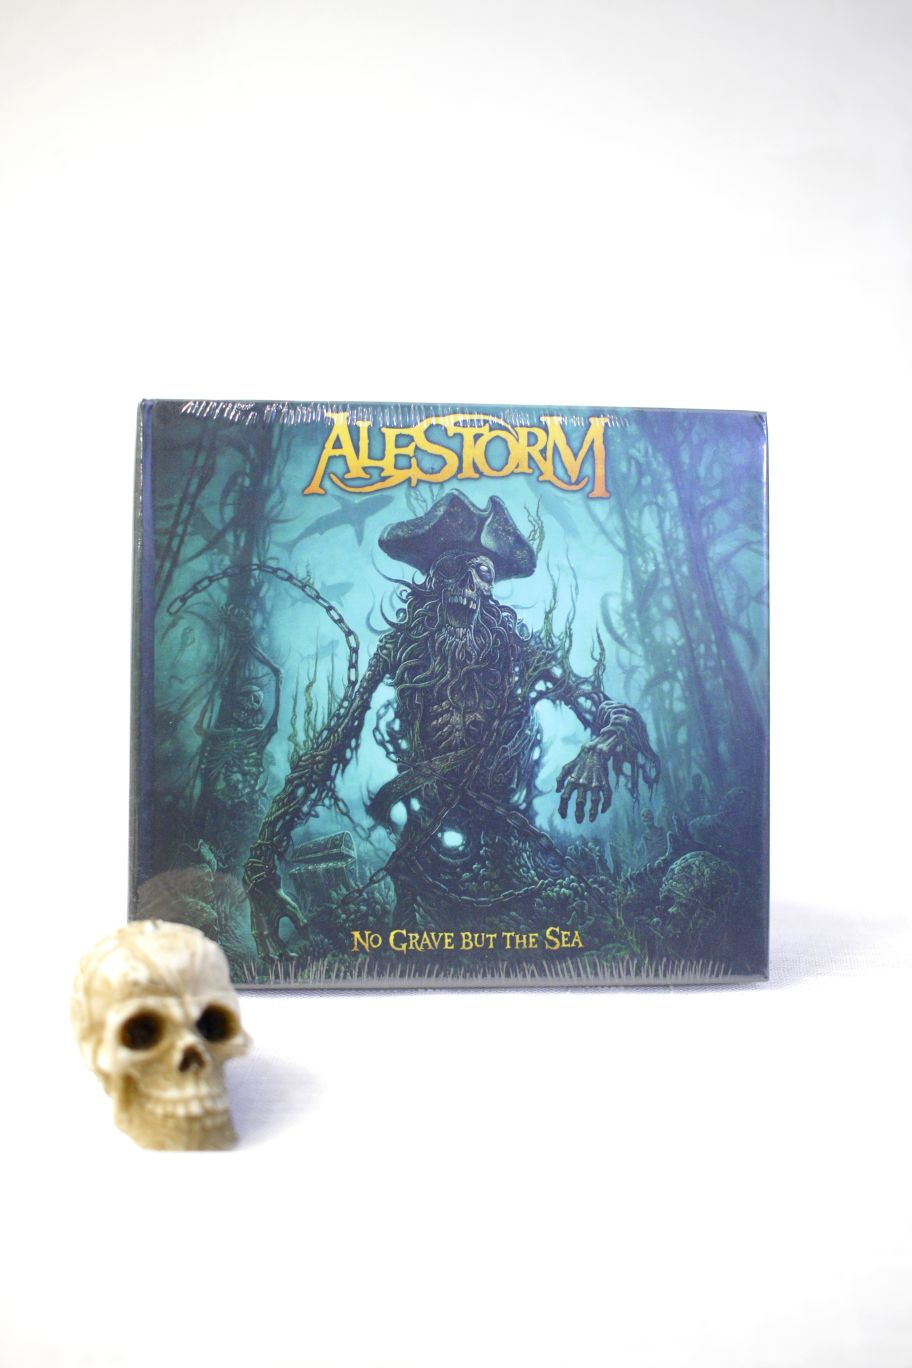 CD ALESTORM NO GRAVE BUT THE SEA (BOOK)